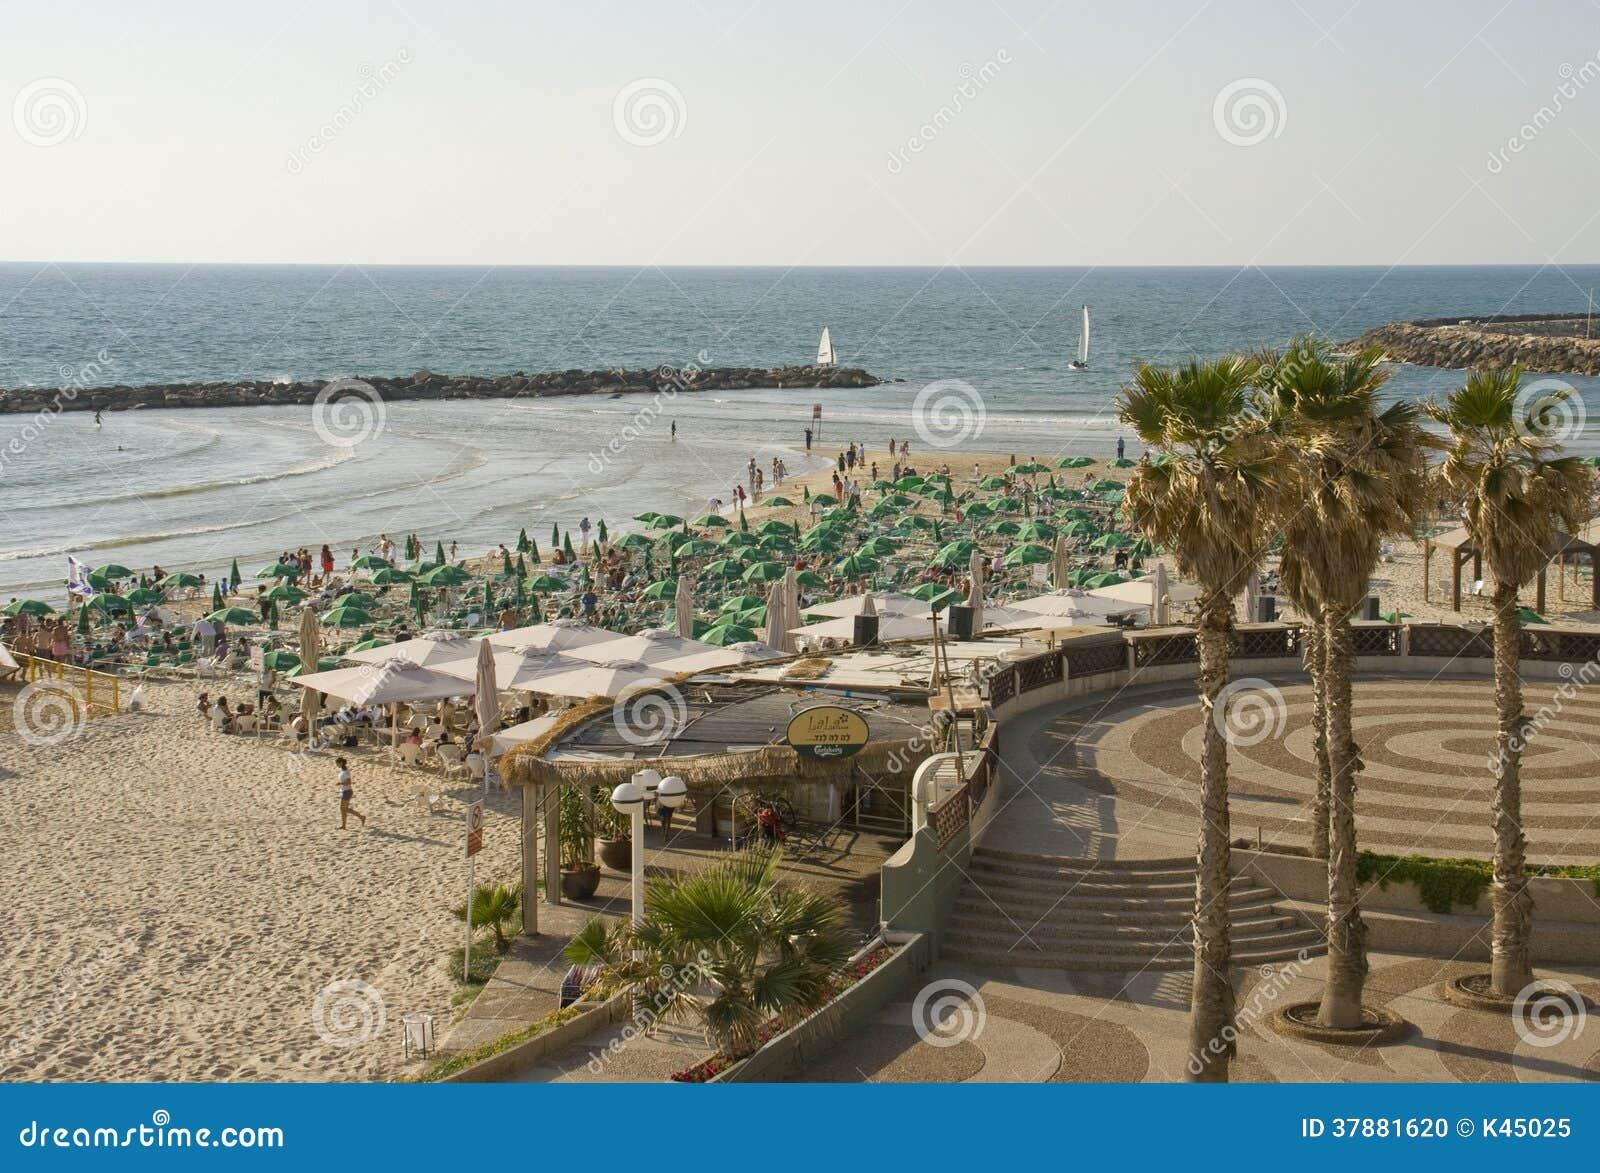 City beach in the city of Tel- Aviv Israel